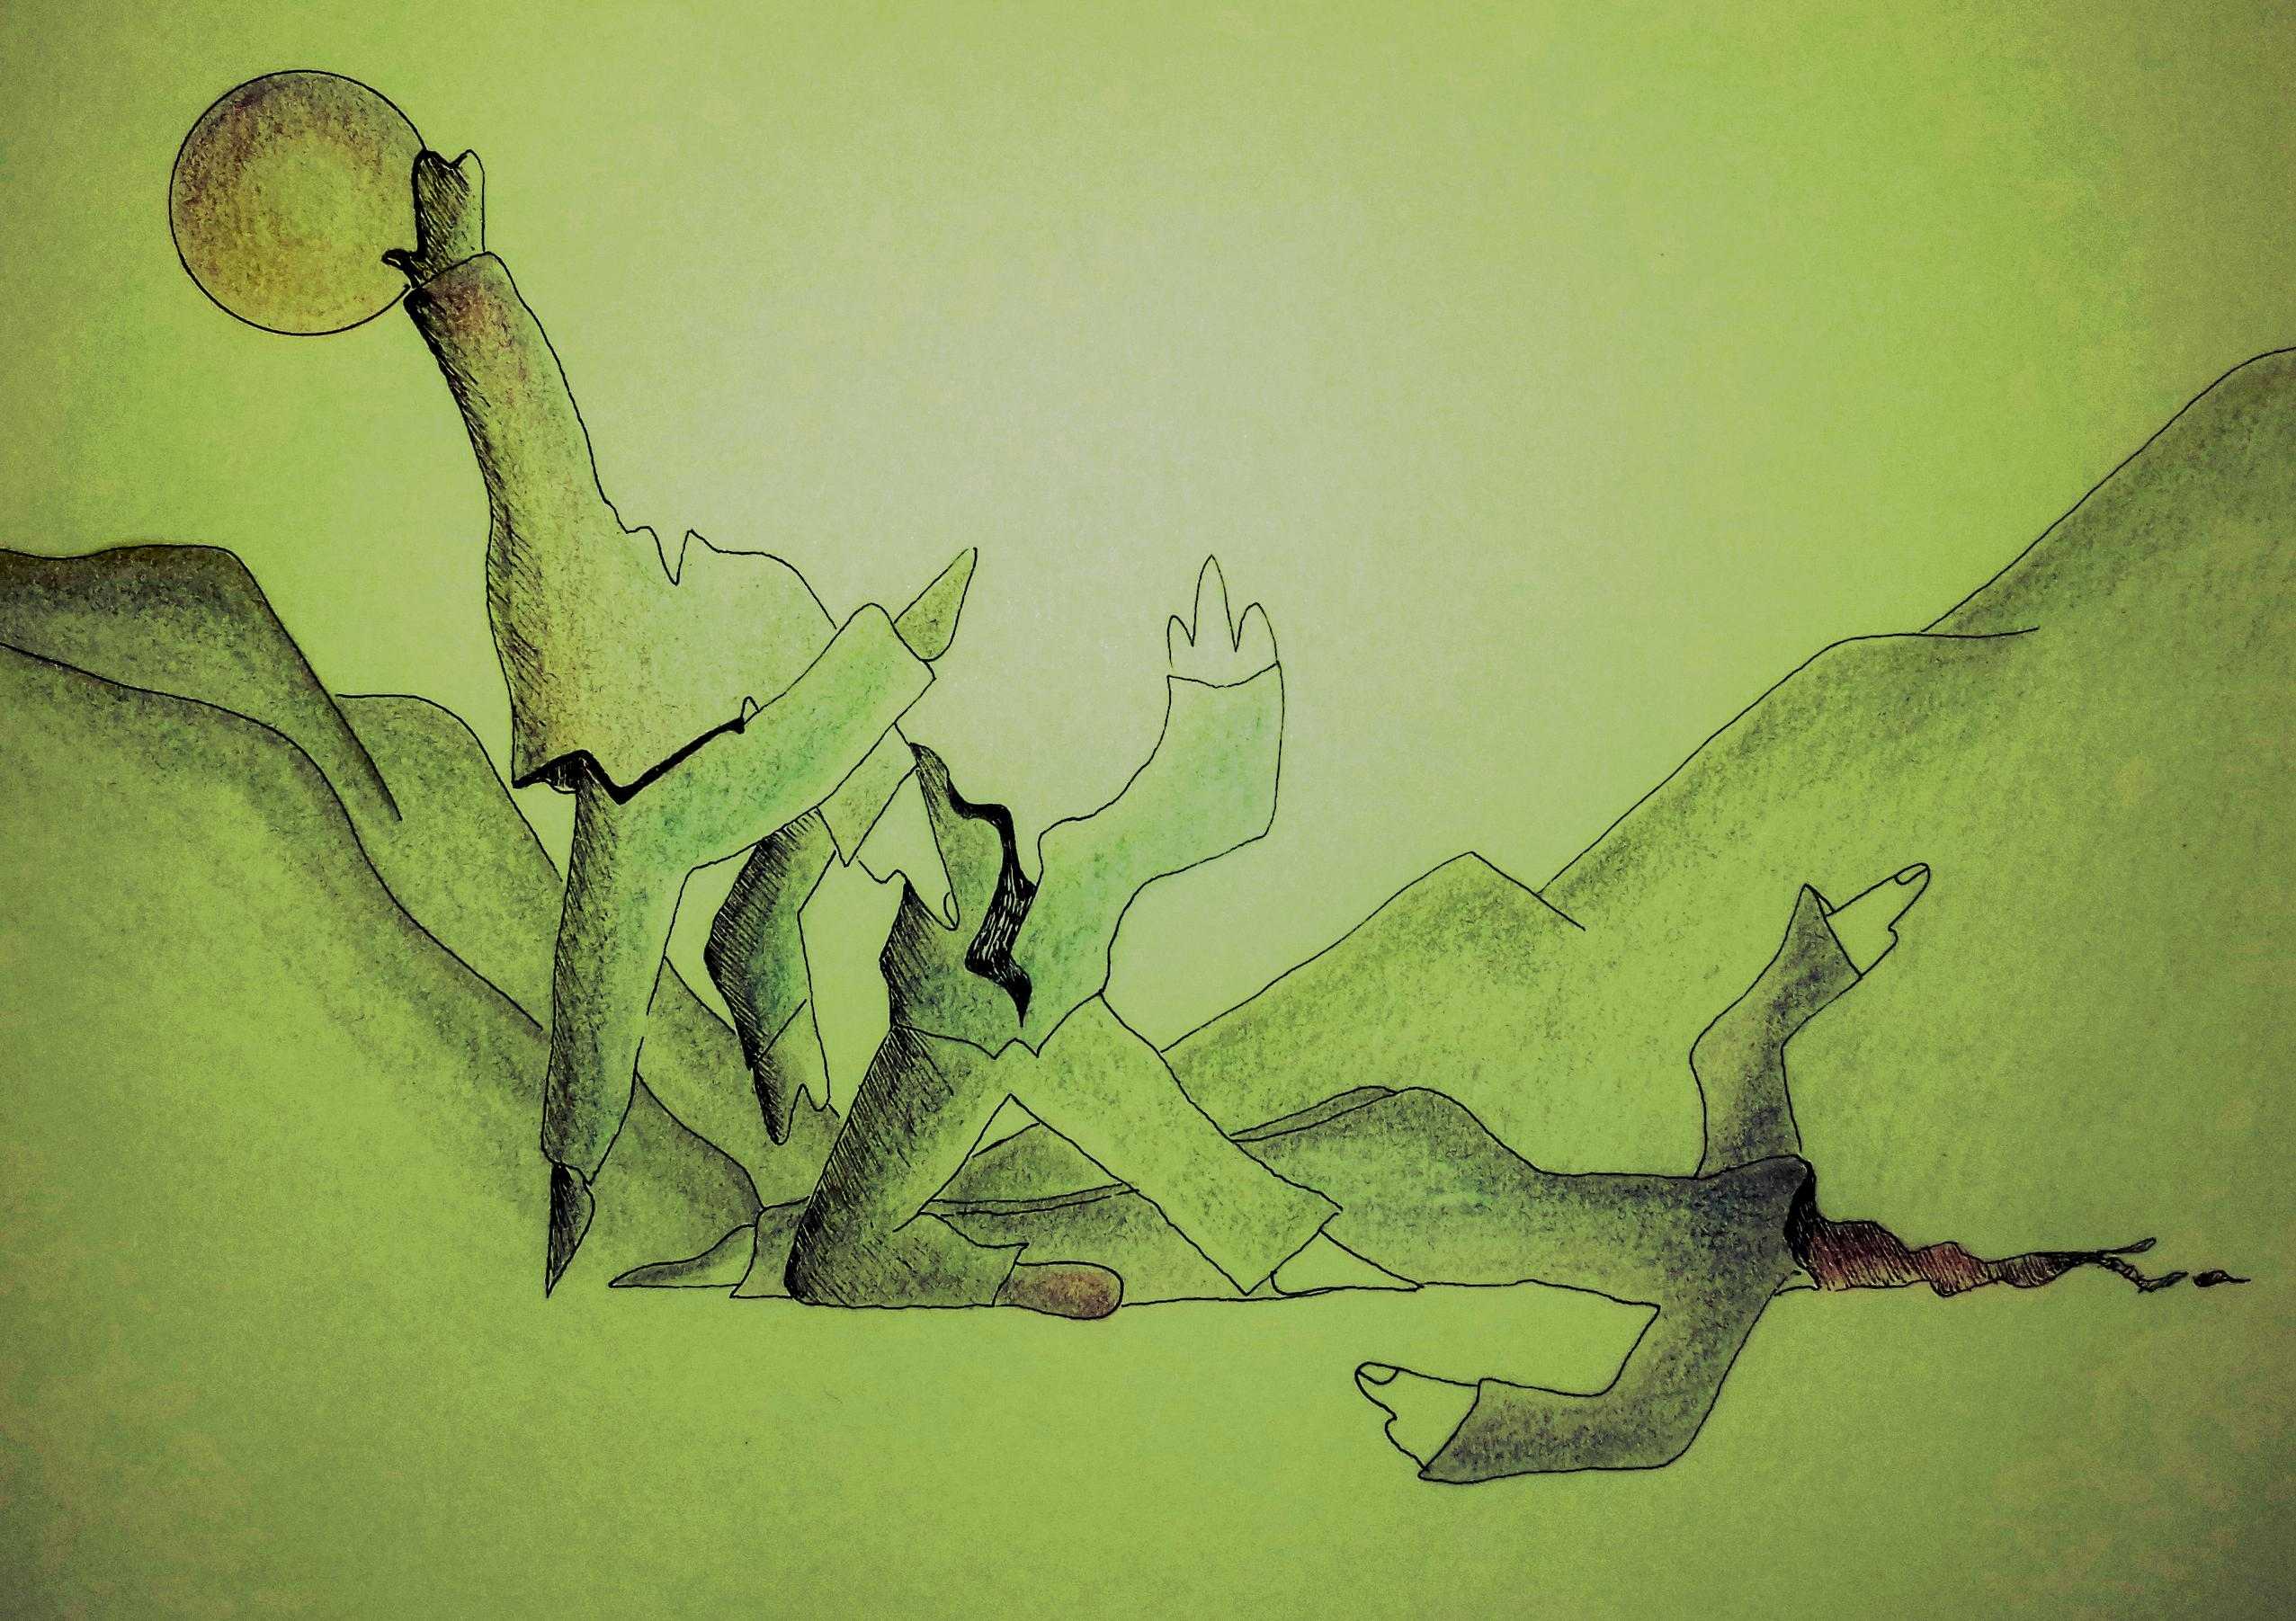 El país del olvido, John Villegas